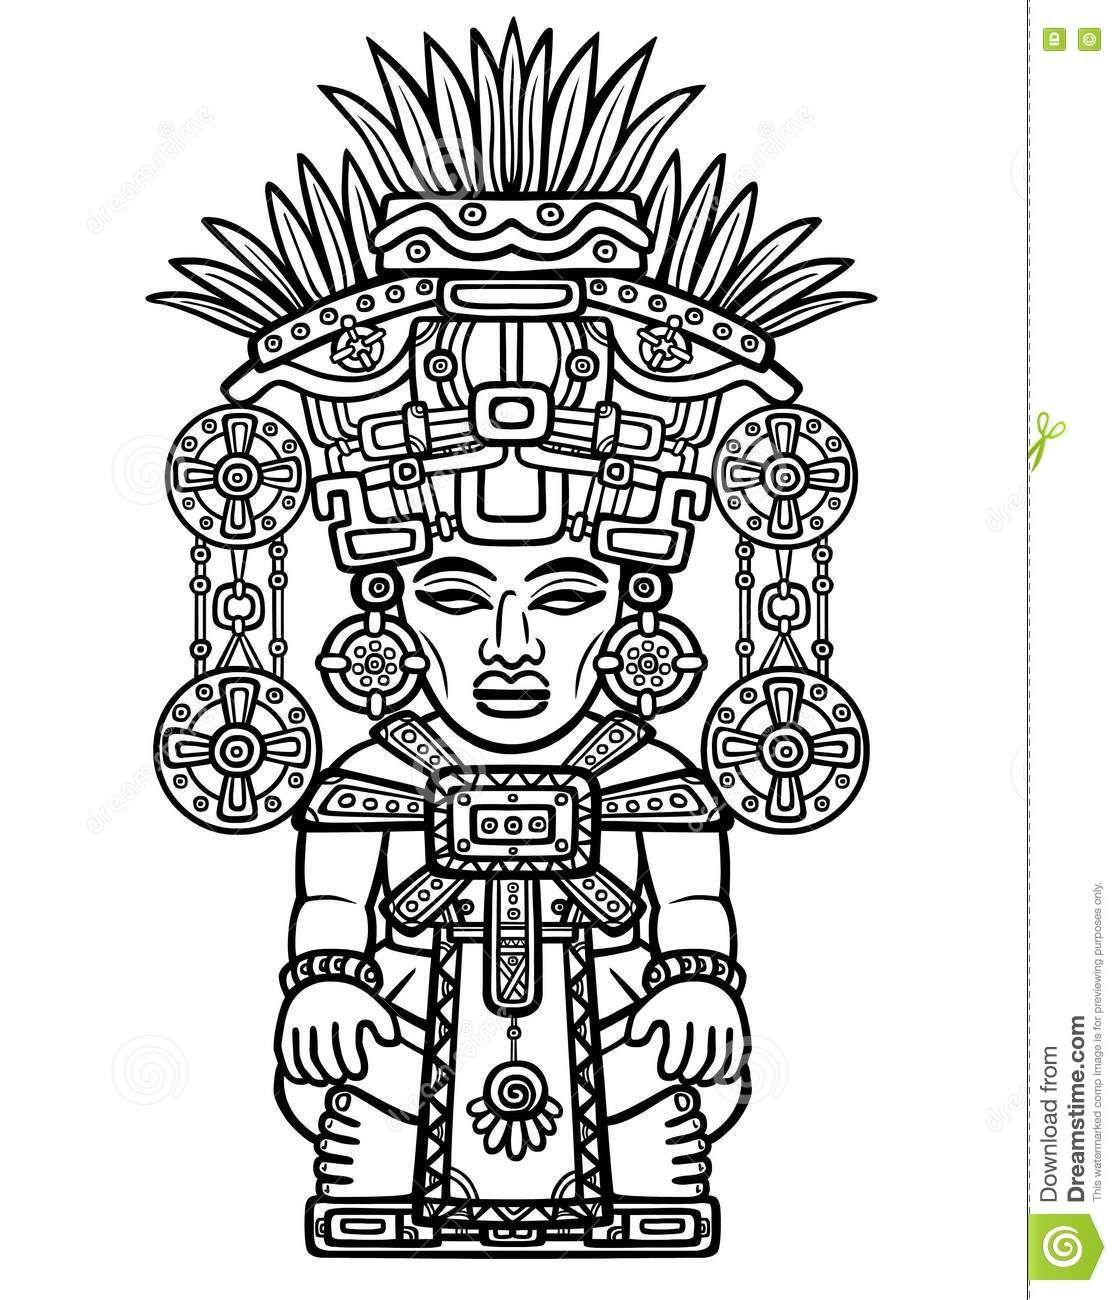 Dibujo Linear Imagen Decorativa De Una Deidad India